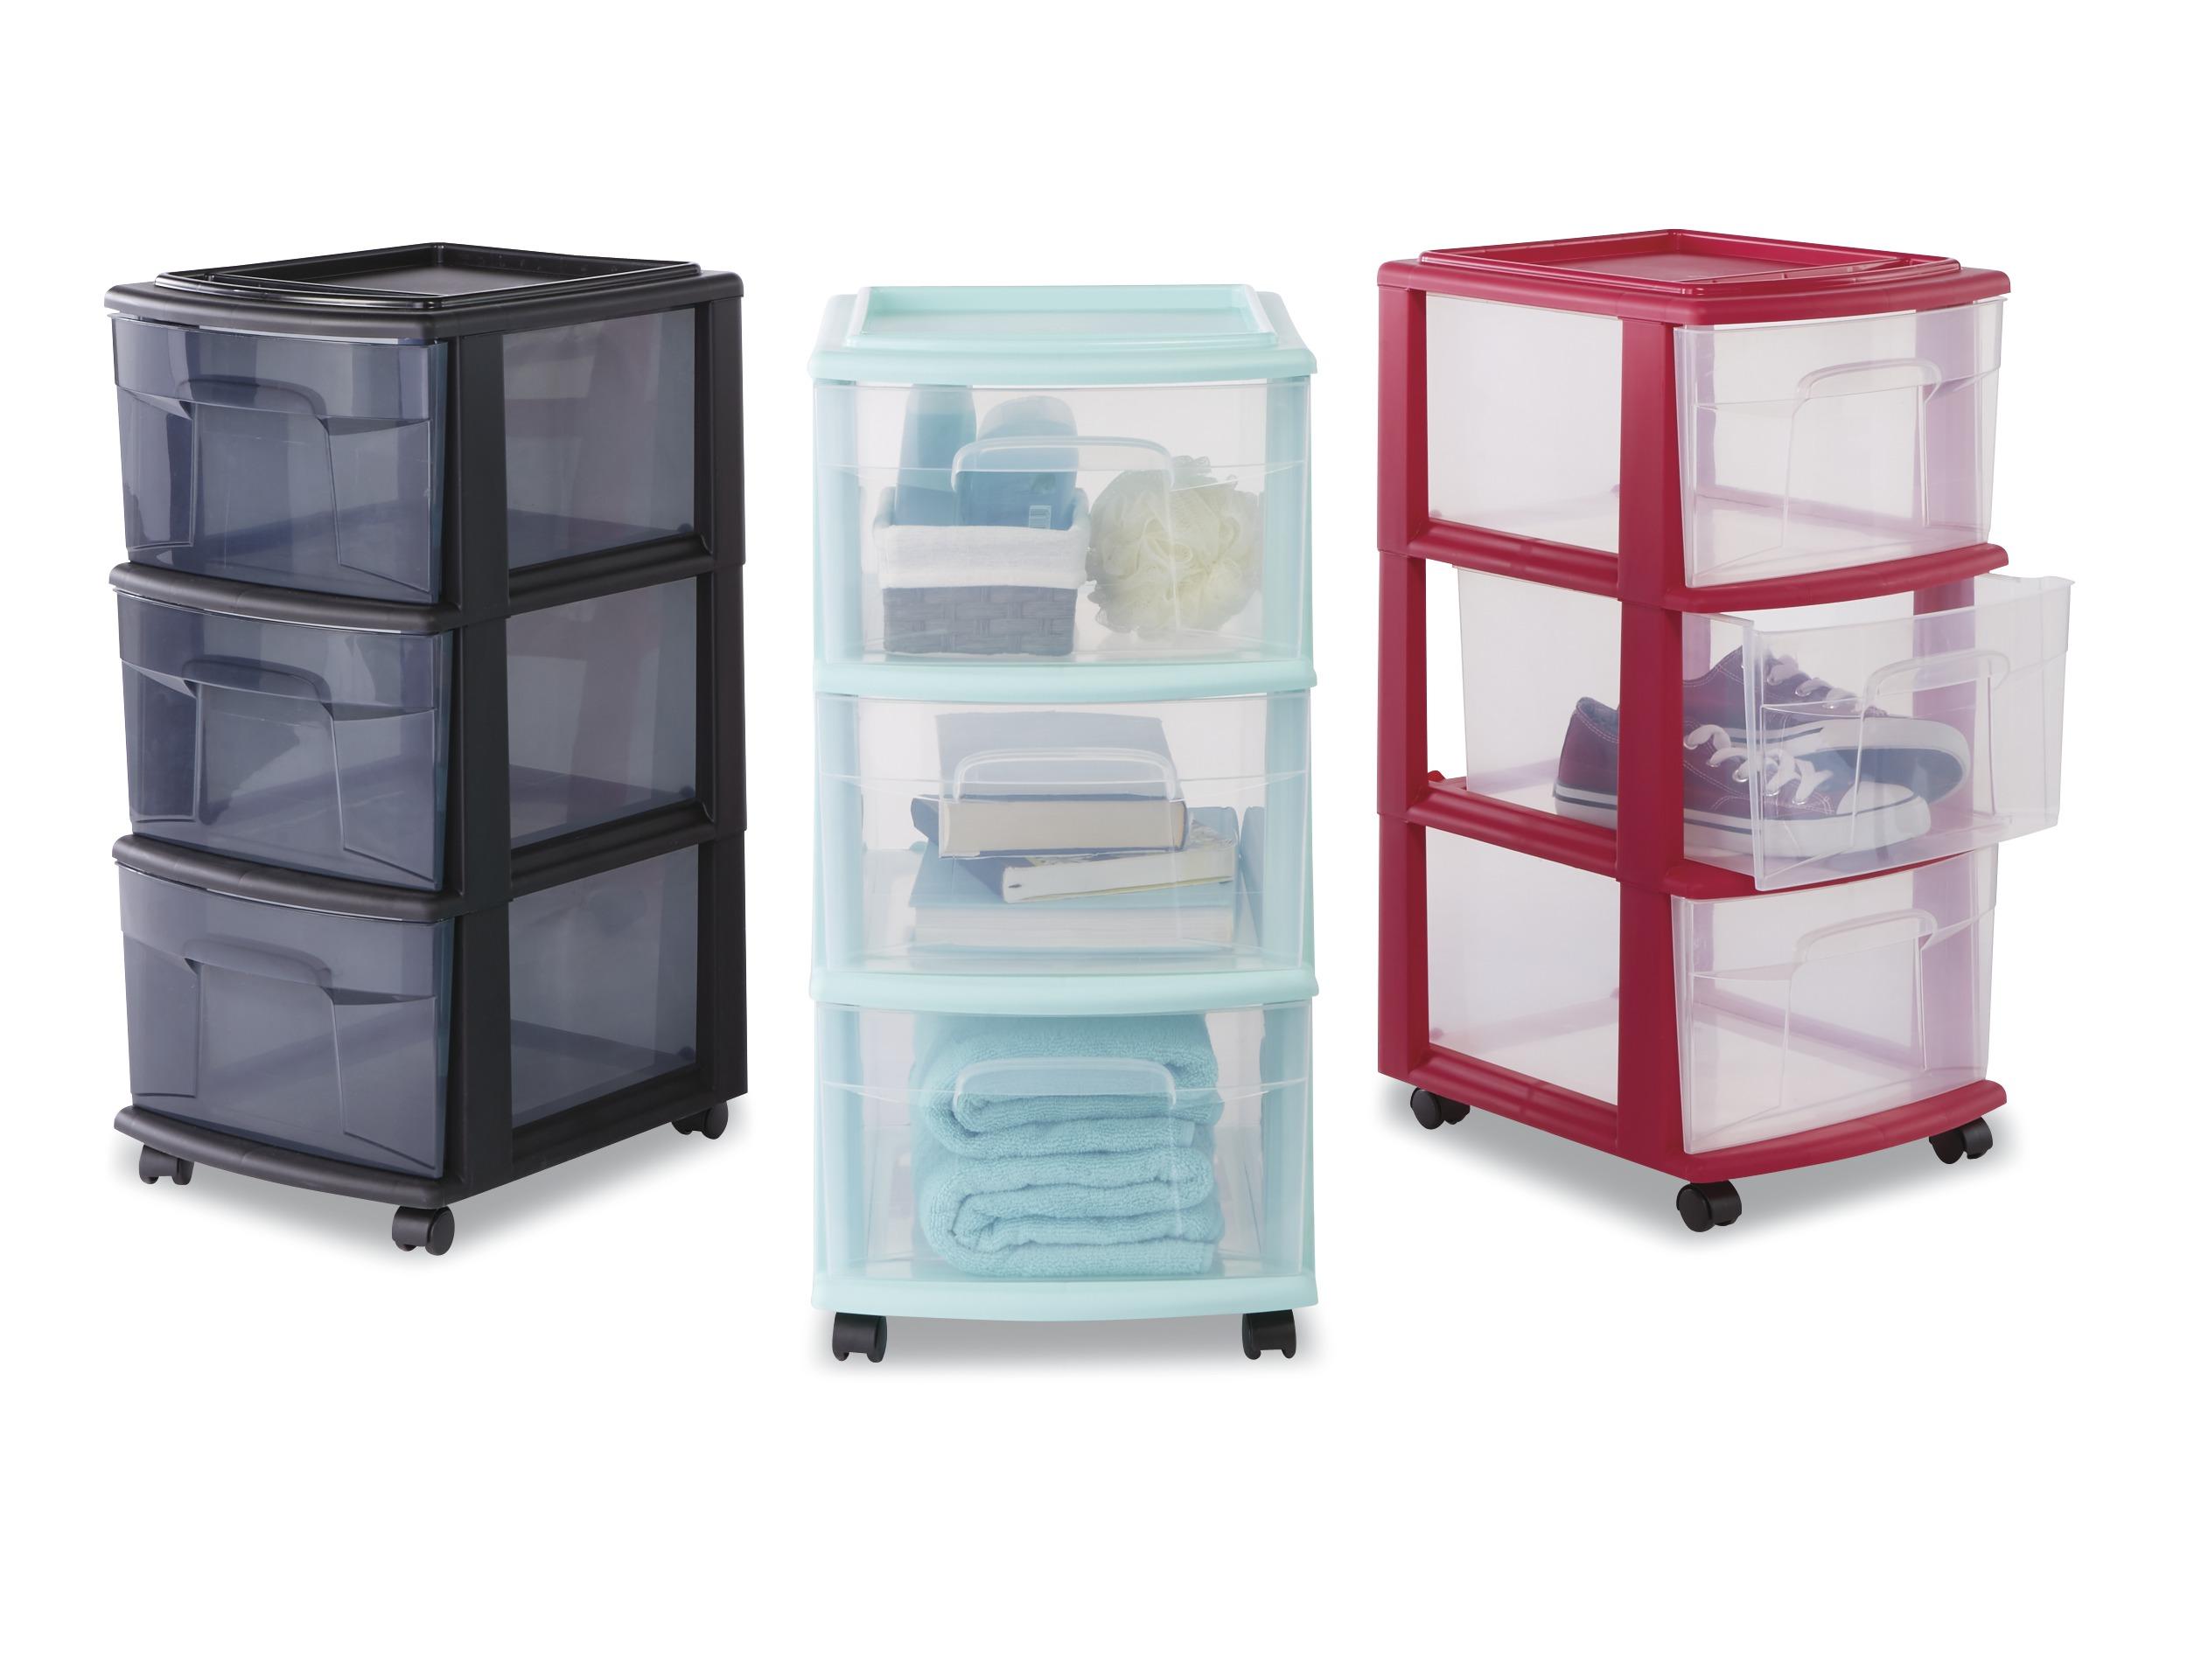 sc 1 st  Kmart & Essential Home 3 Drawer Storage Cart